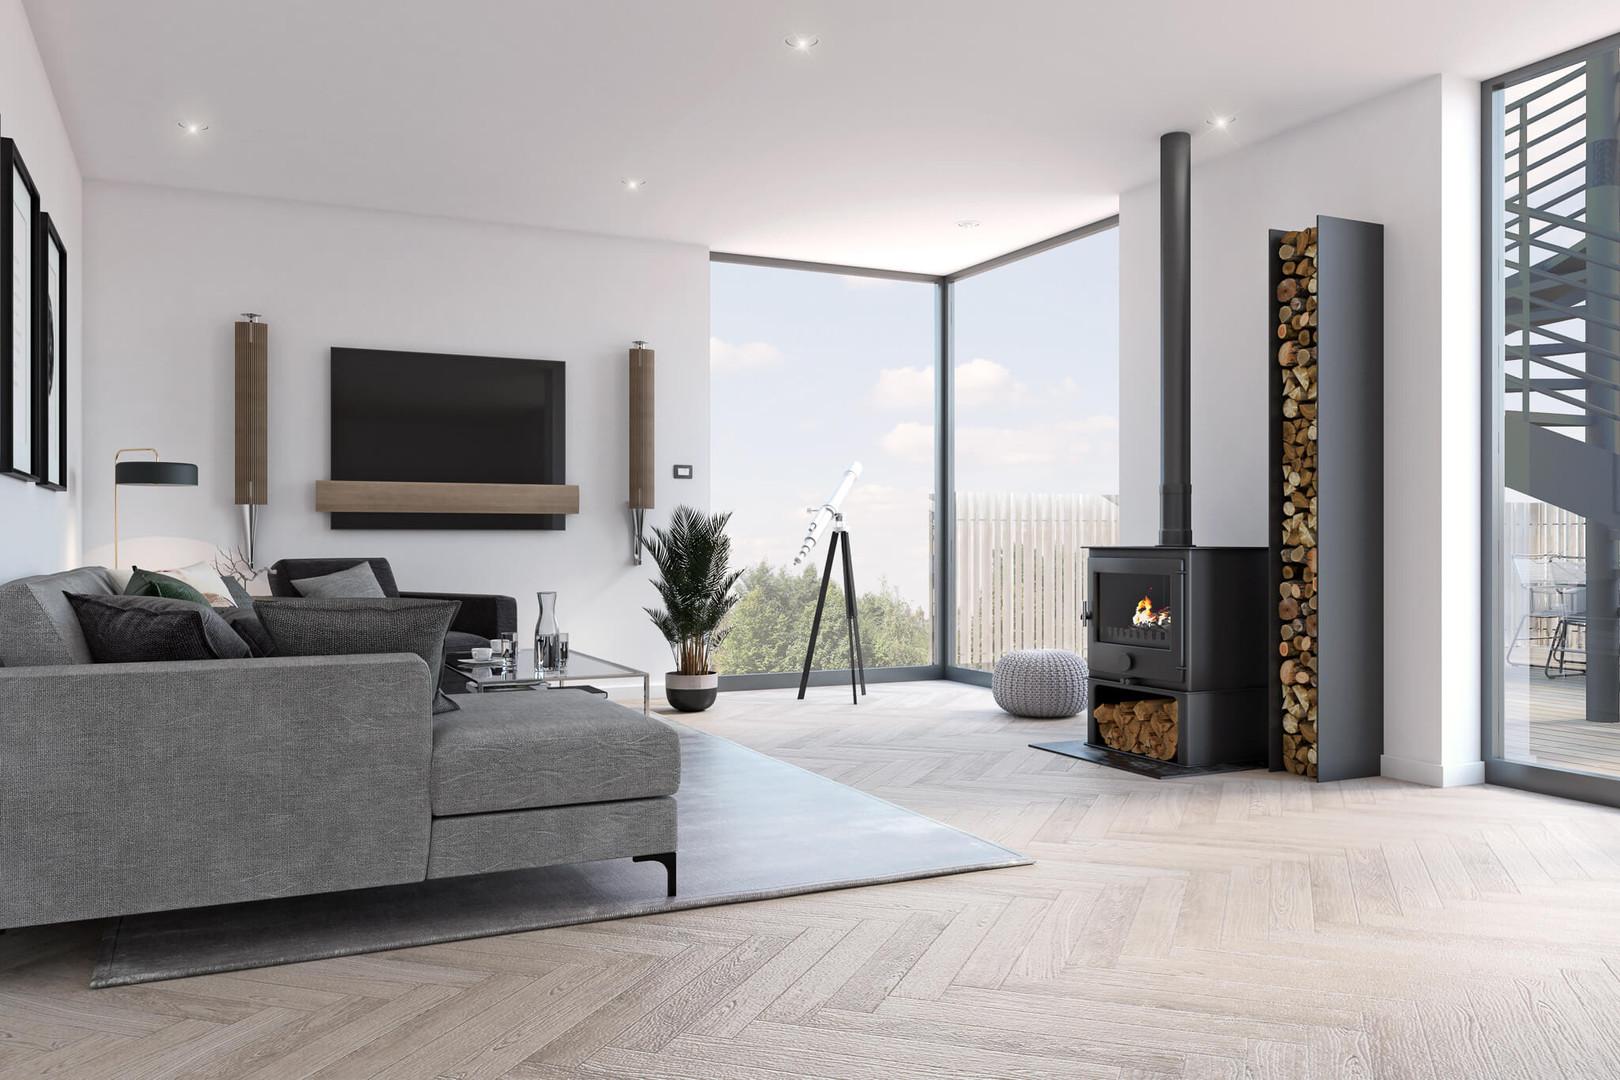 interior-cgi-lodge-hill-living-Room.jpg